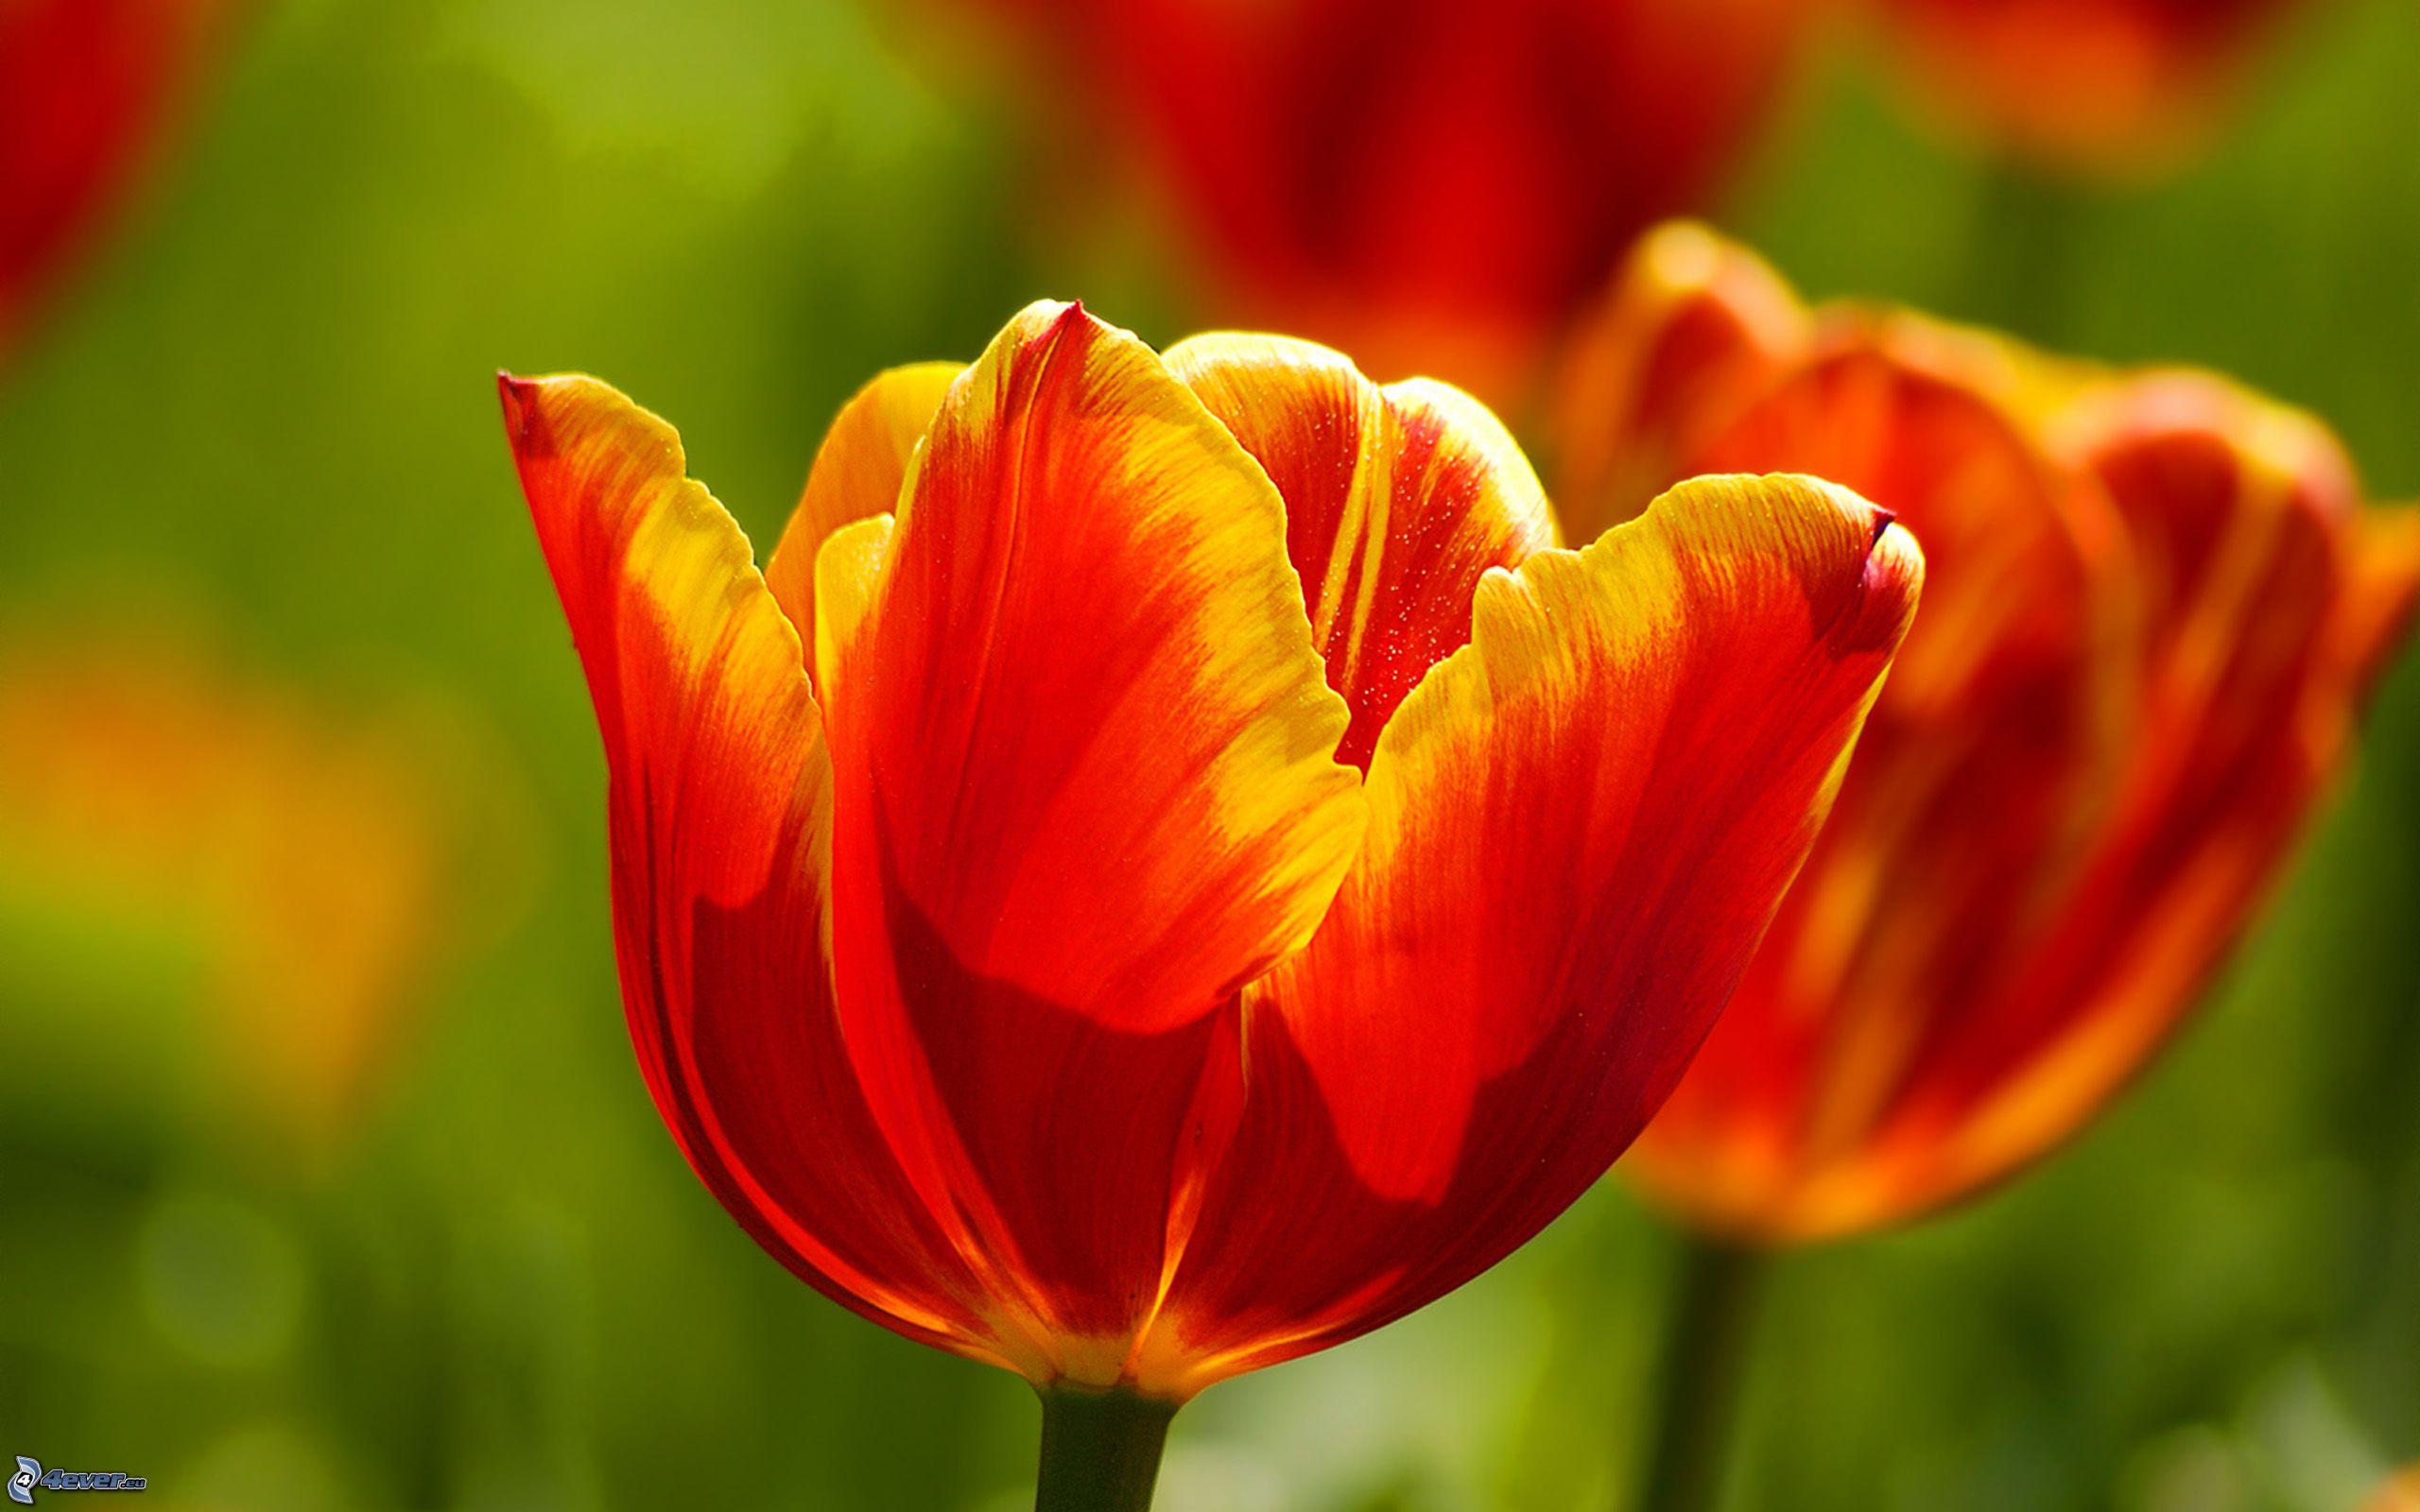 Rot gelbe tulpen